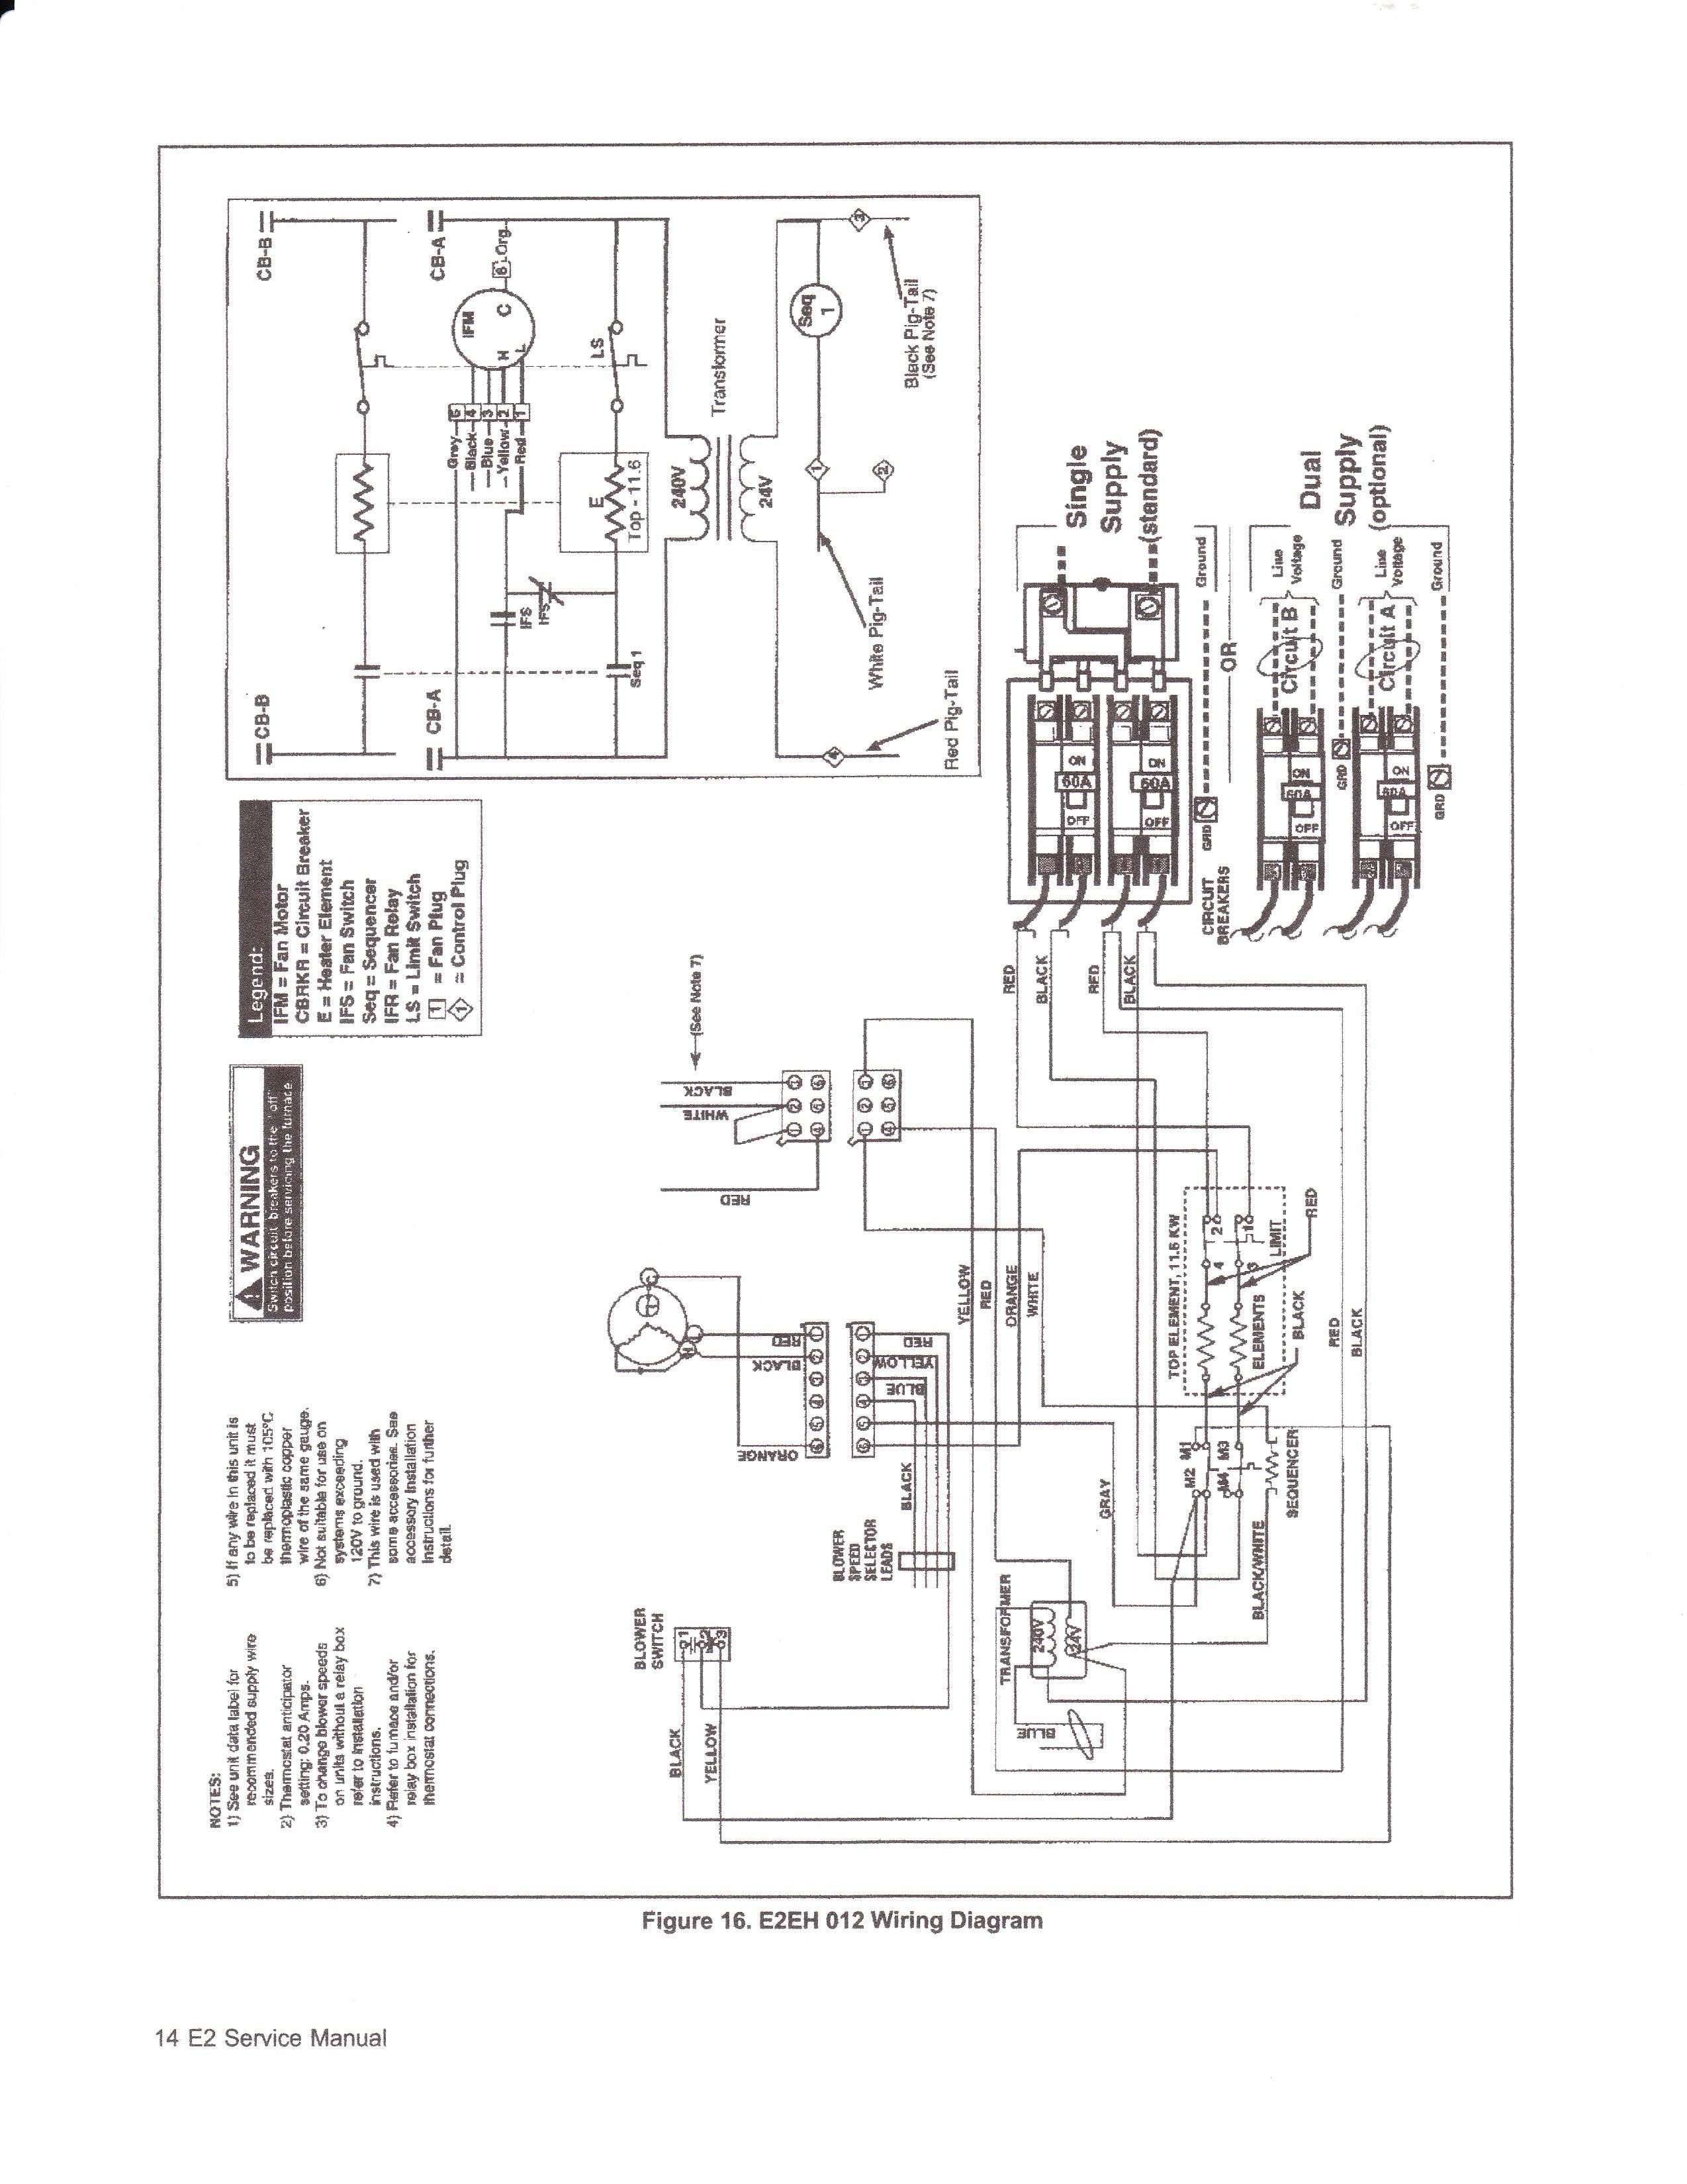 Gibson Hvac Wiring Diagram New nordyne Wiring Diagram Electric Furnace New Intertherm Electric